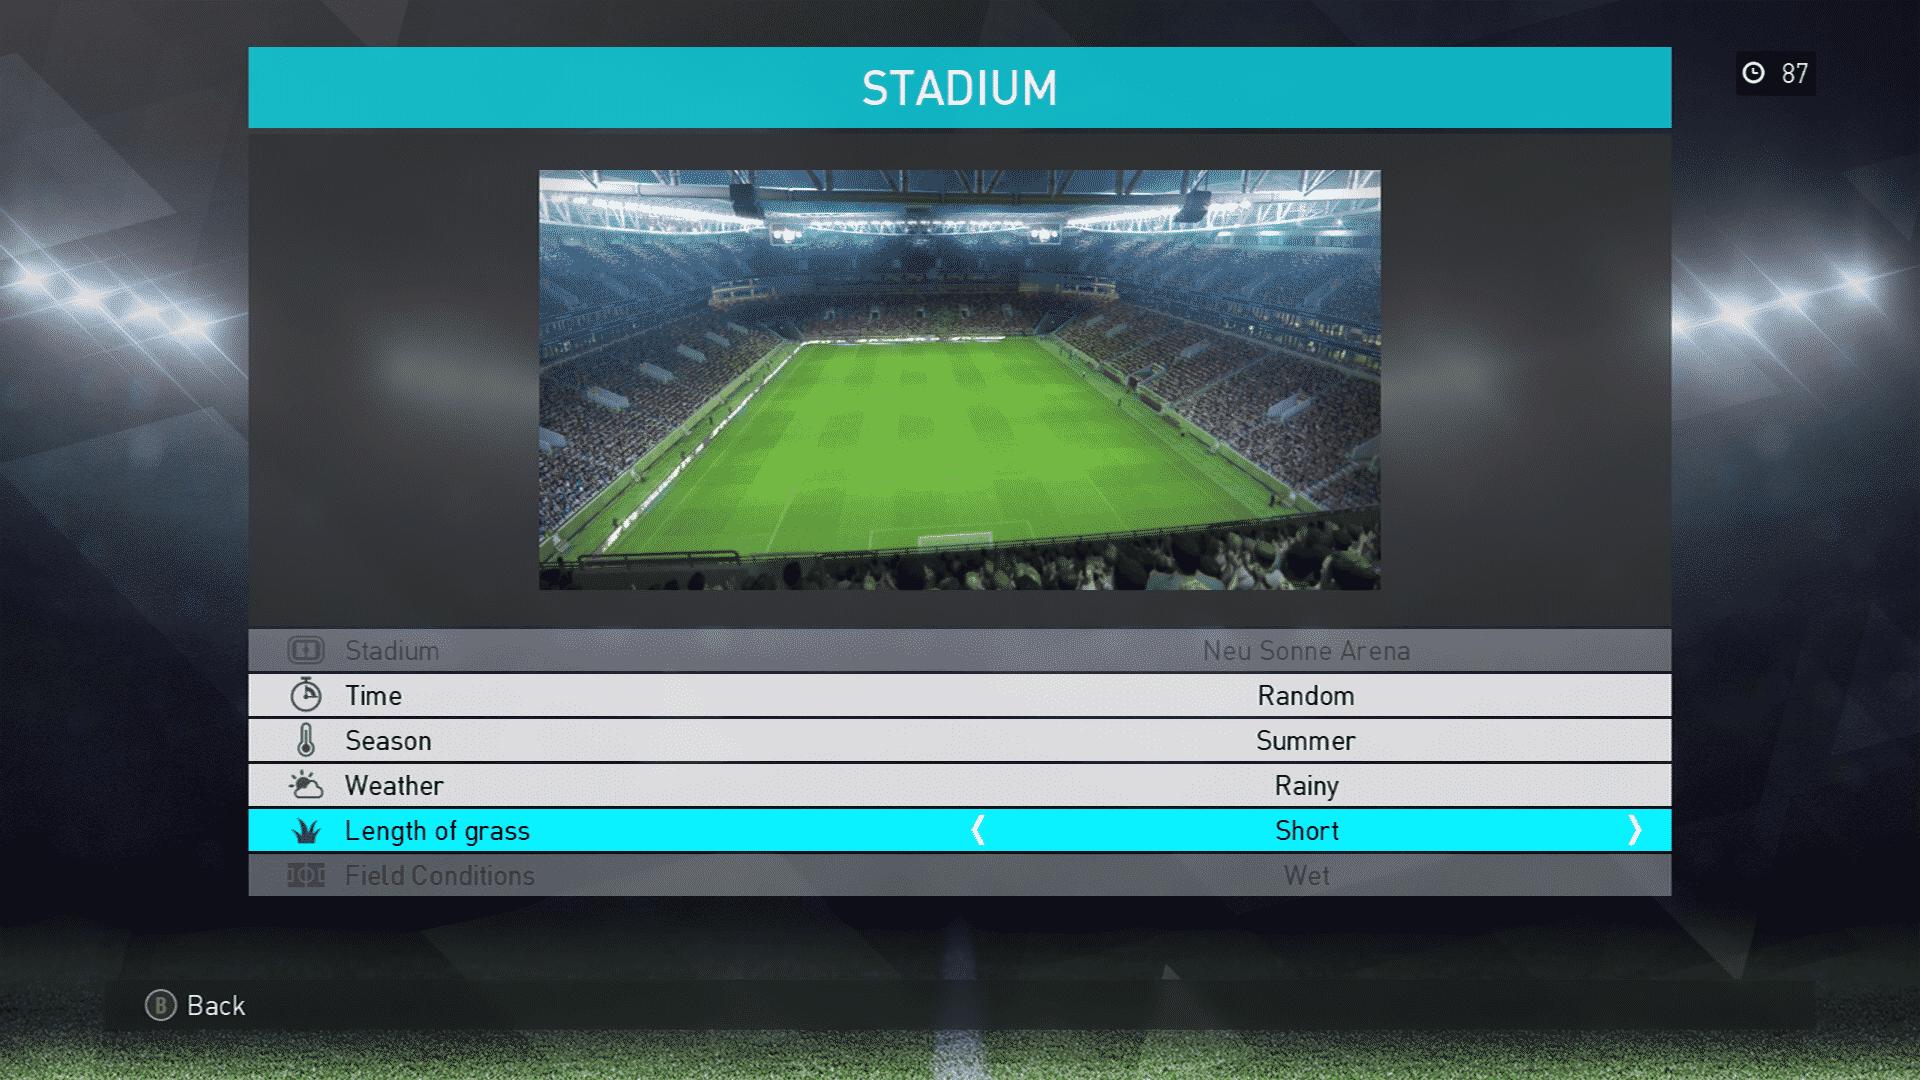 PES 2018 Stadium Selection